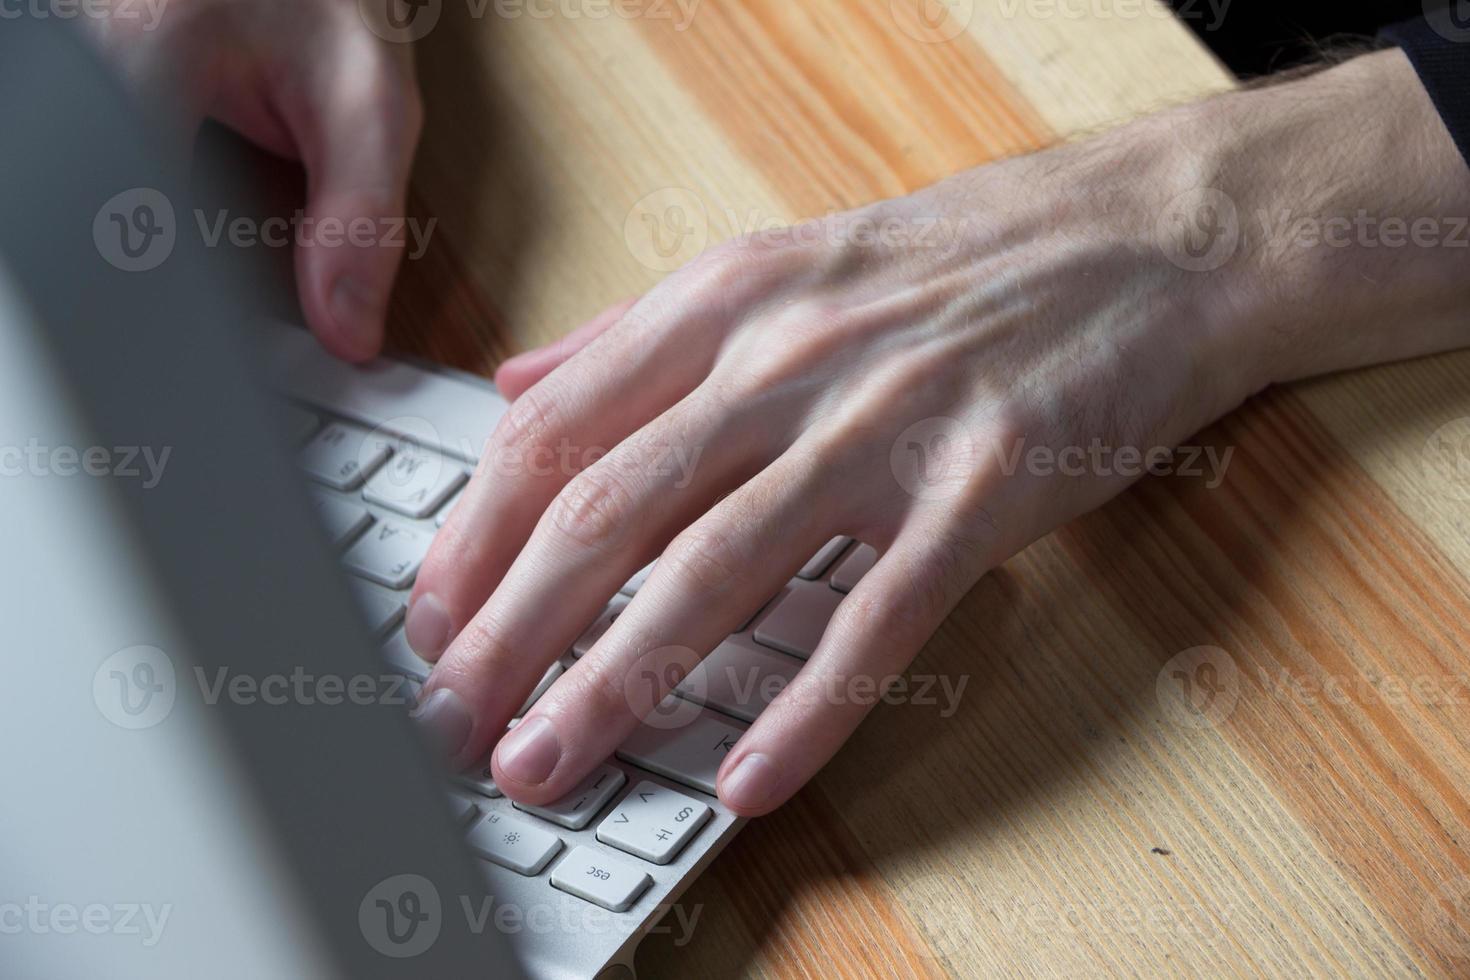 Cerca de mecanografiar las manos del hombre foto